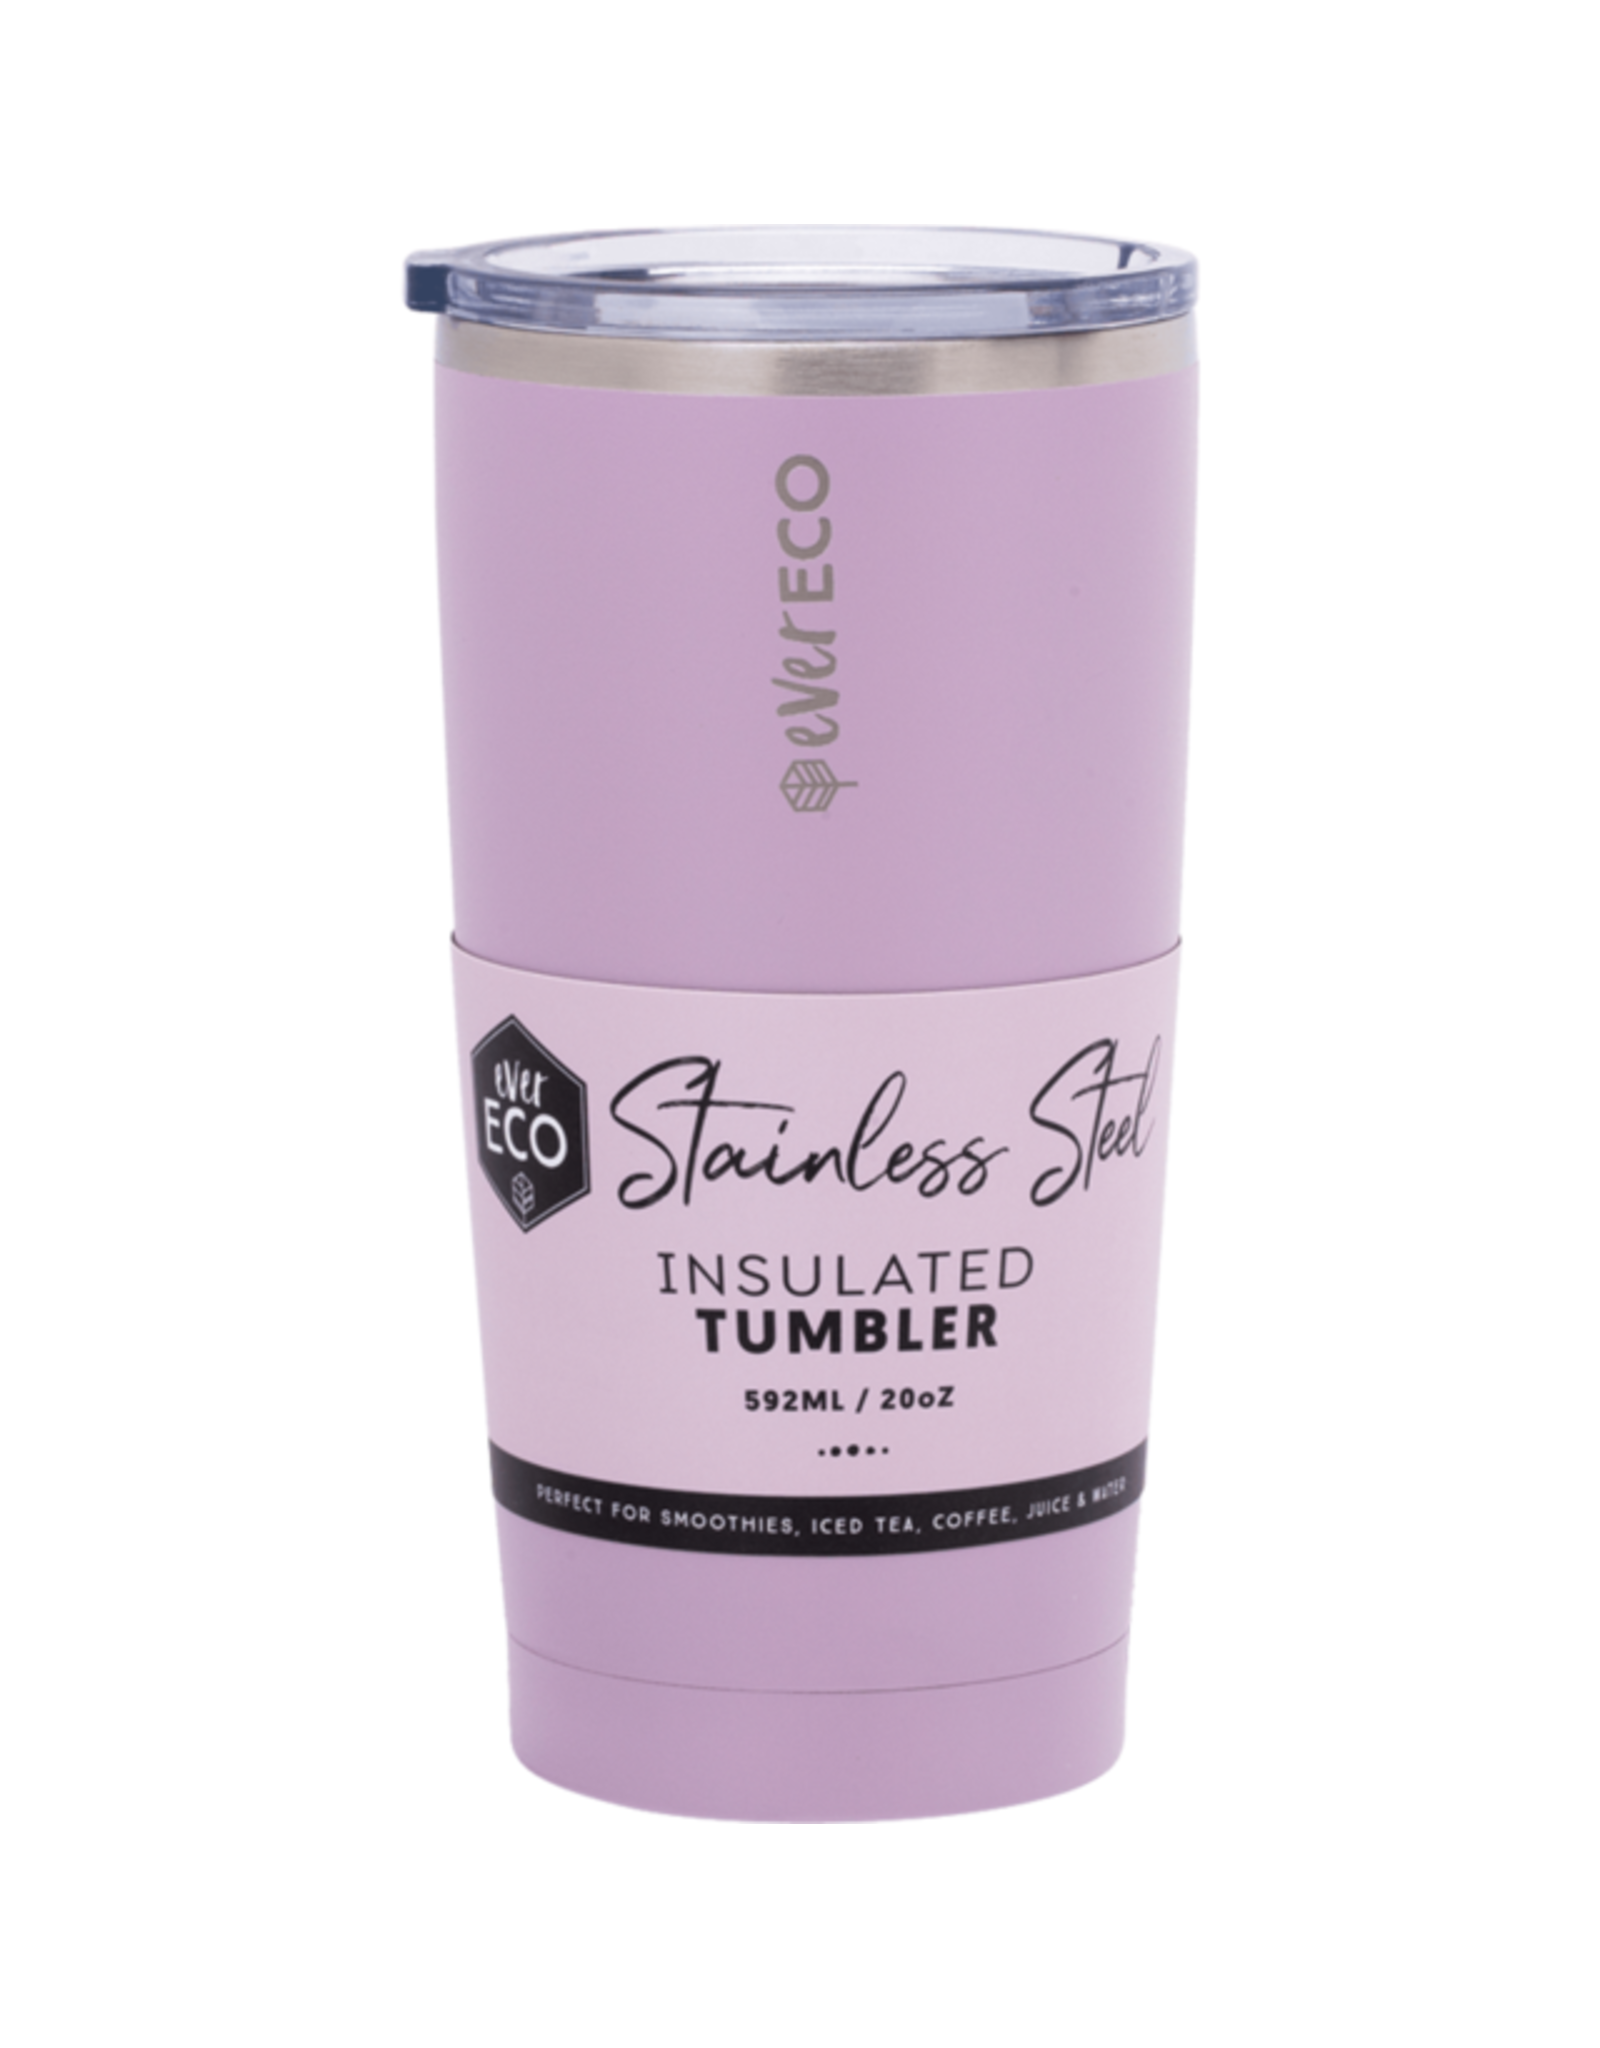 Ever Eco Insulated Tumbler 592ml